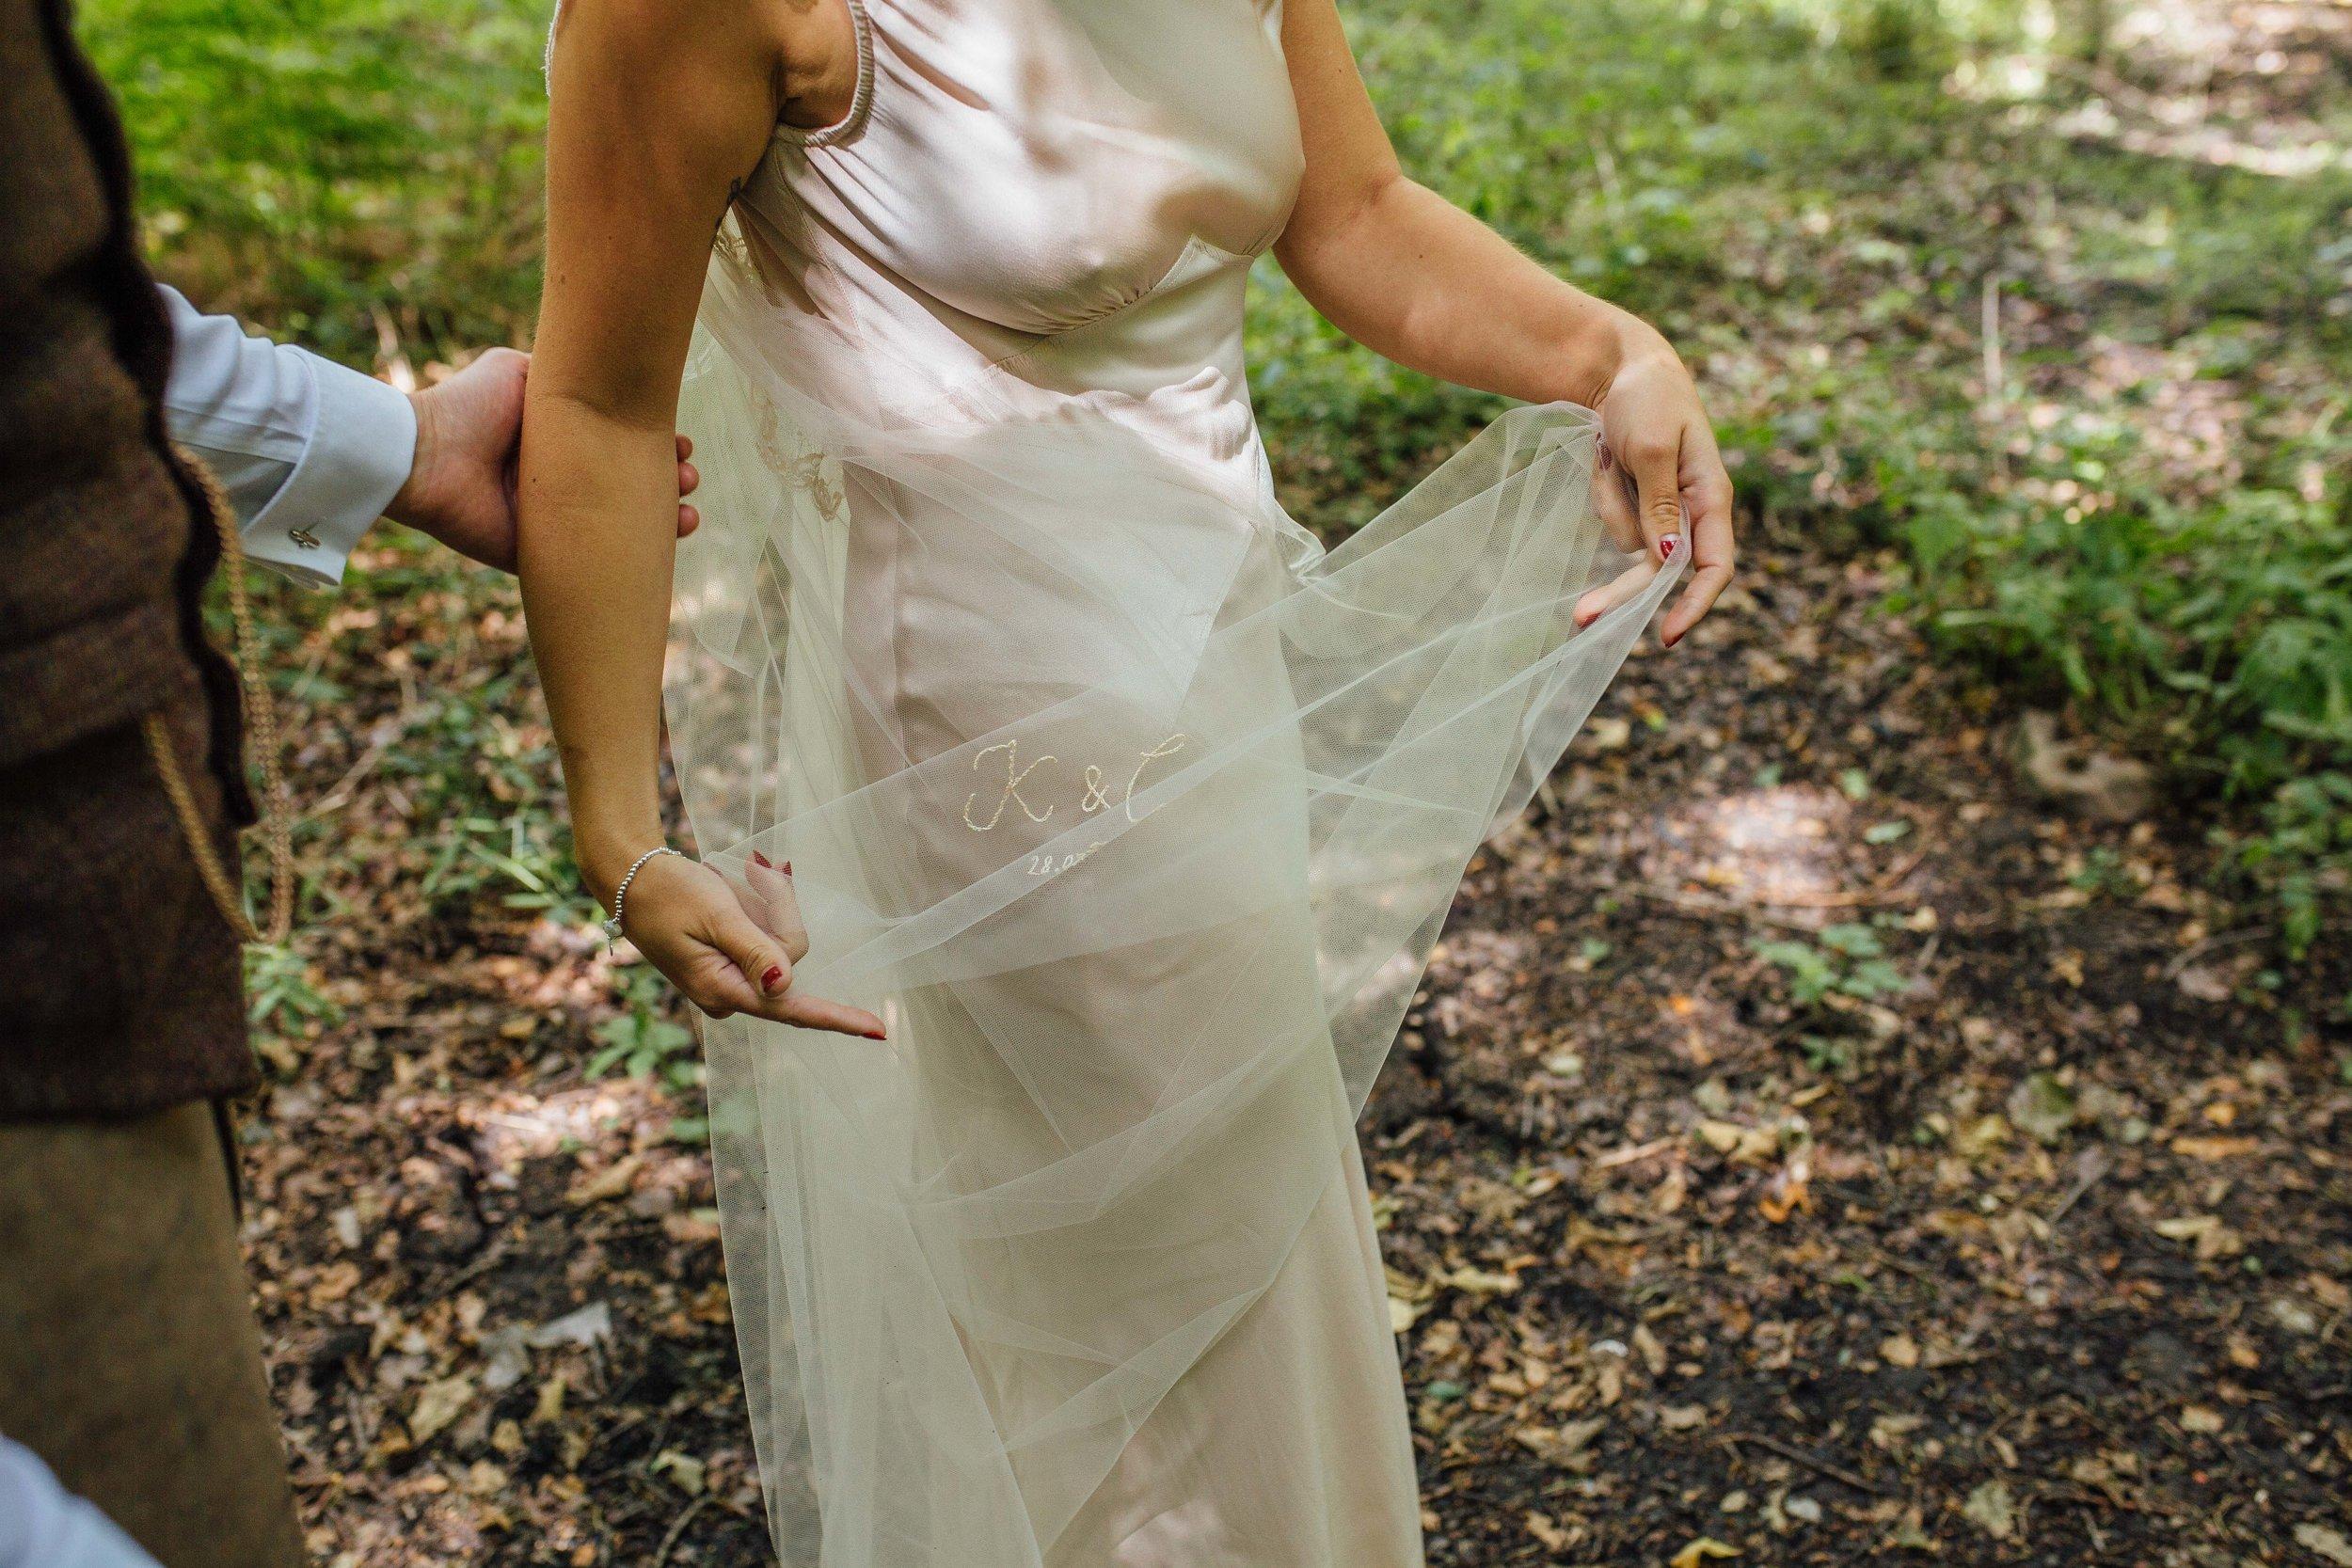 Katy-Bespoke-Veil-Sheffield-Wedding-Wes-Anderson-Susanna-Greening-Derbyshire-10